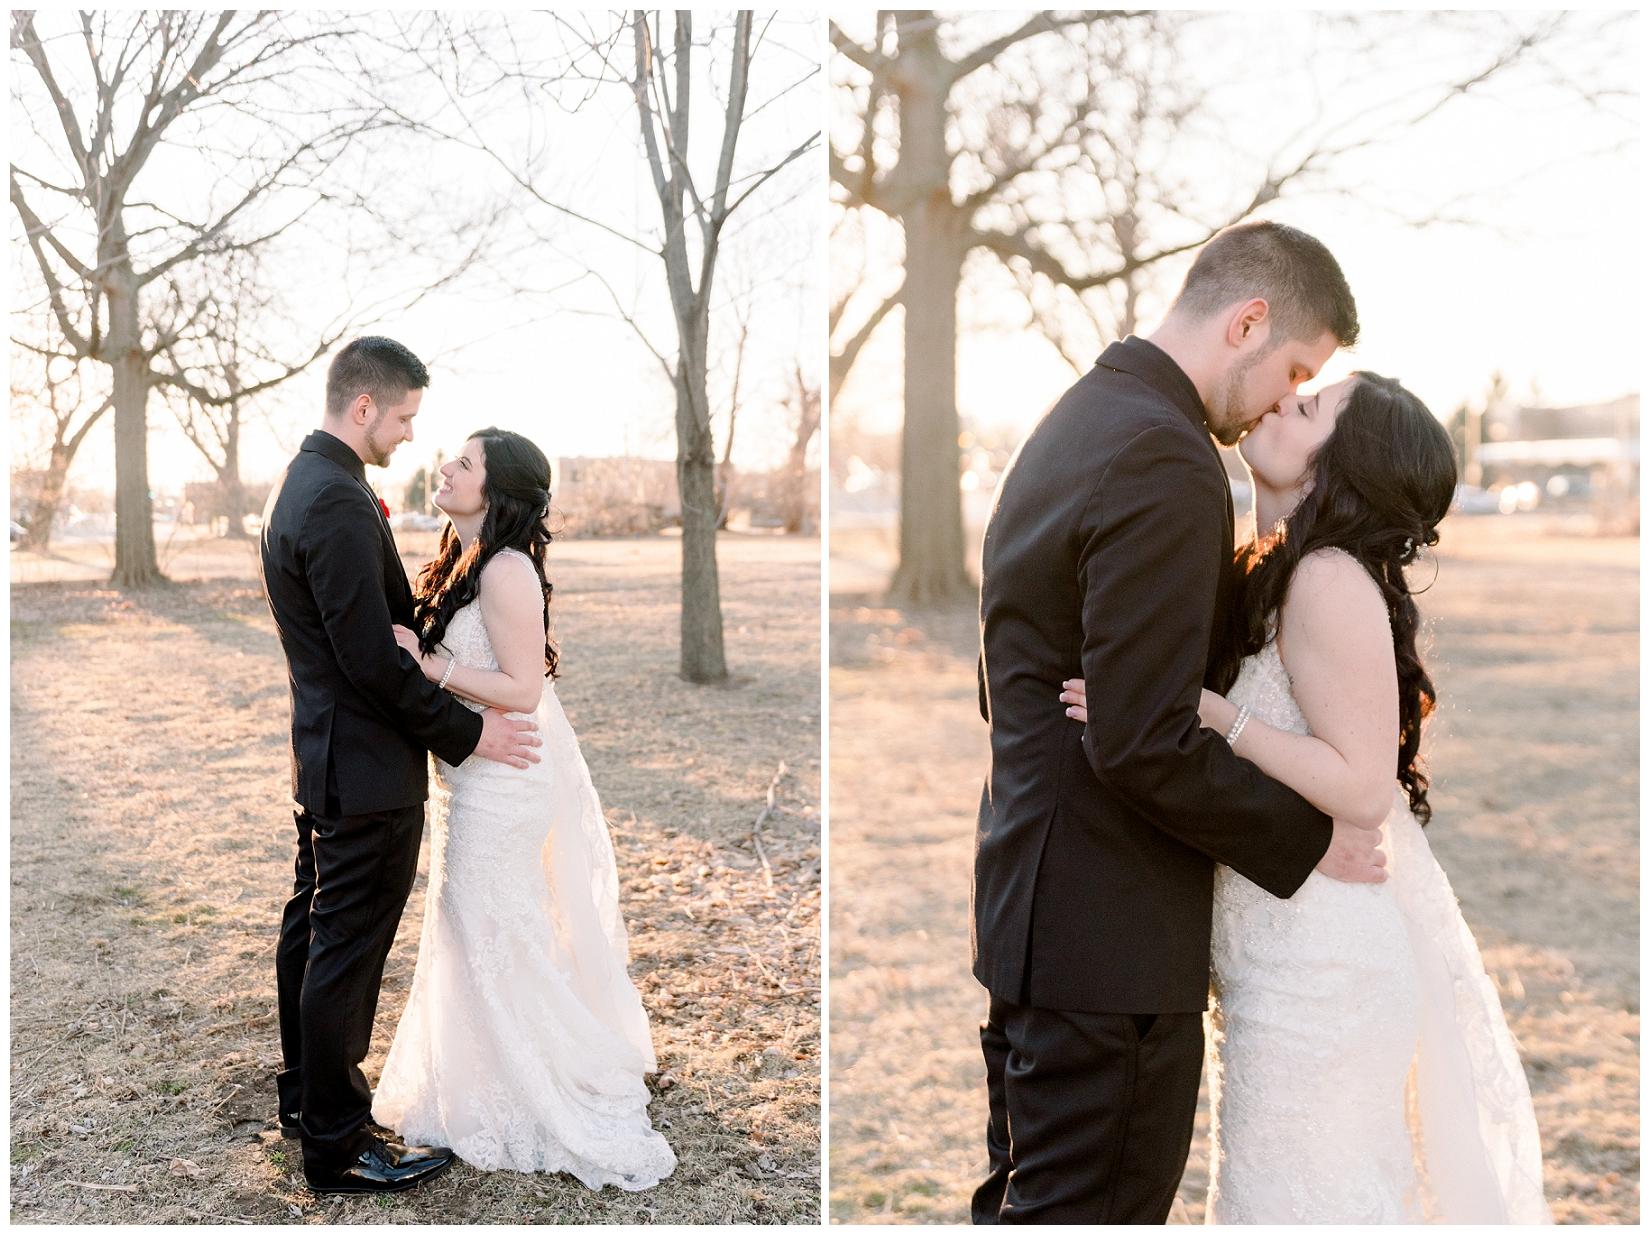 cat-alkire-wedding-photographer-indiana-chicago-indianapolis-fort-wayne_1131.jpg